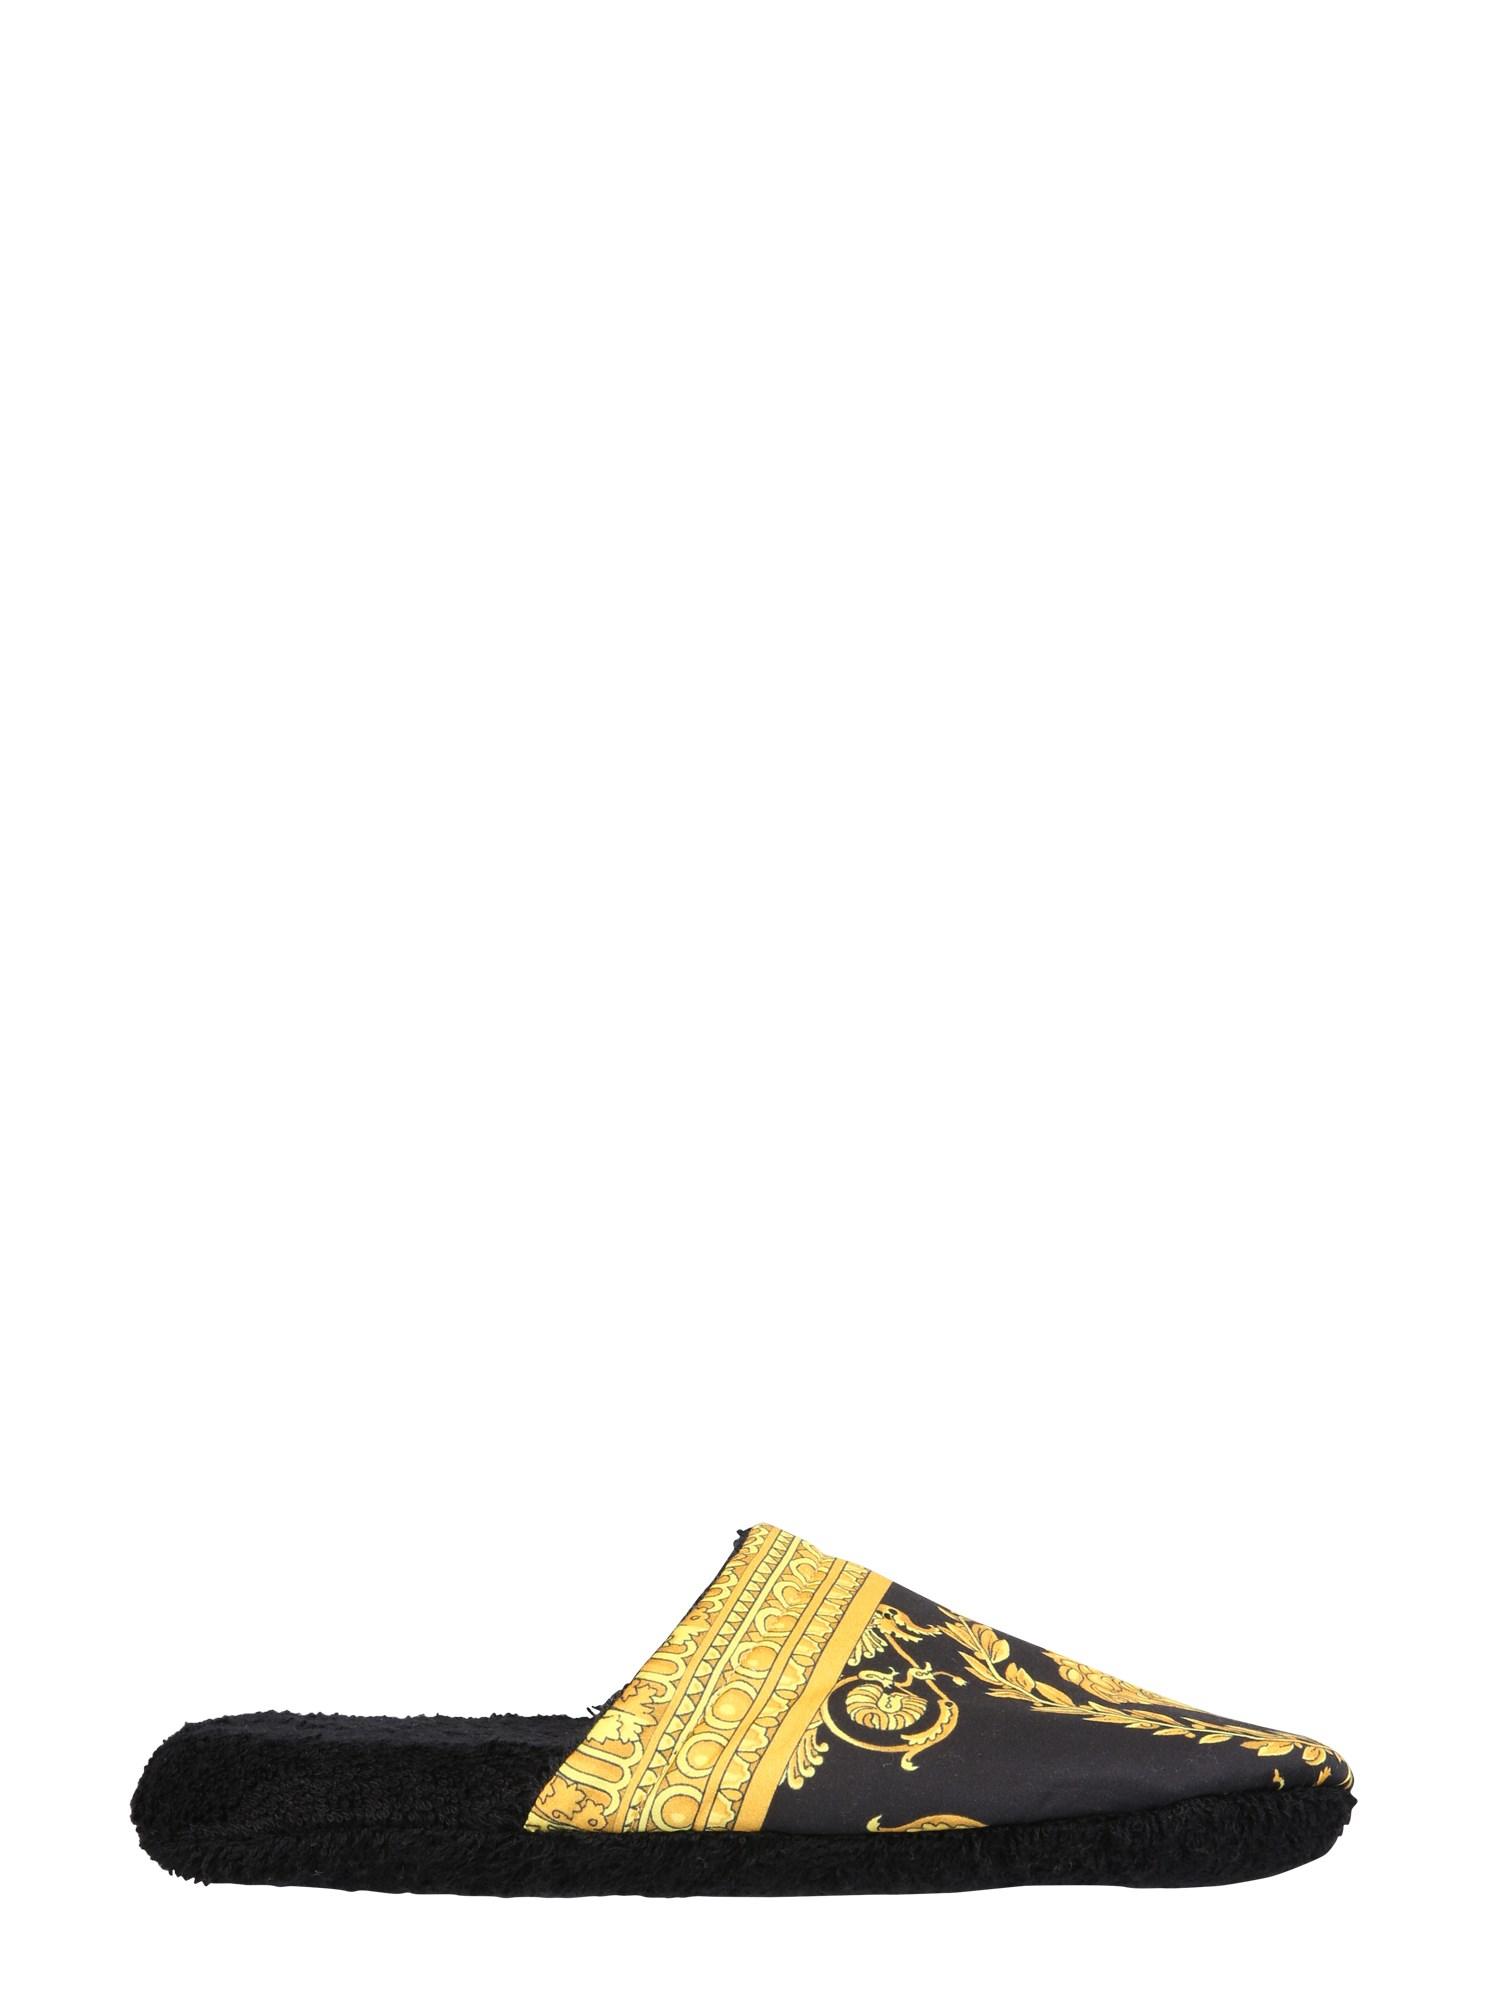 Versace cotton slippers - versace - Modalova